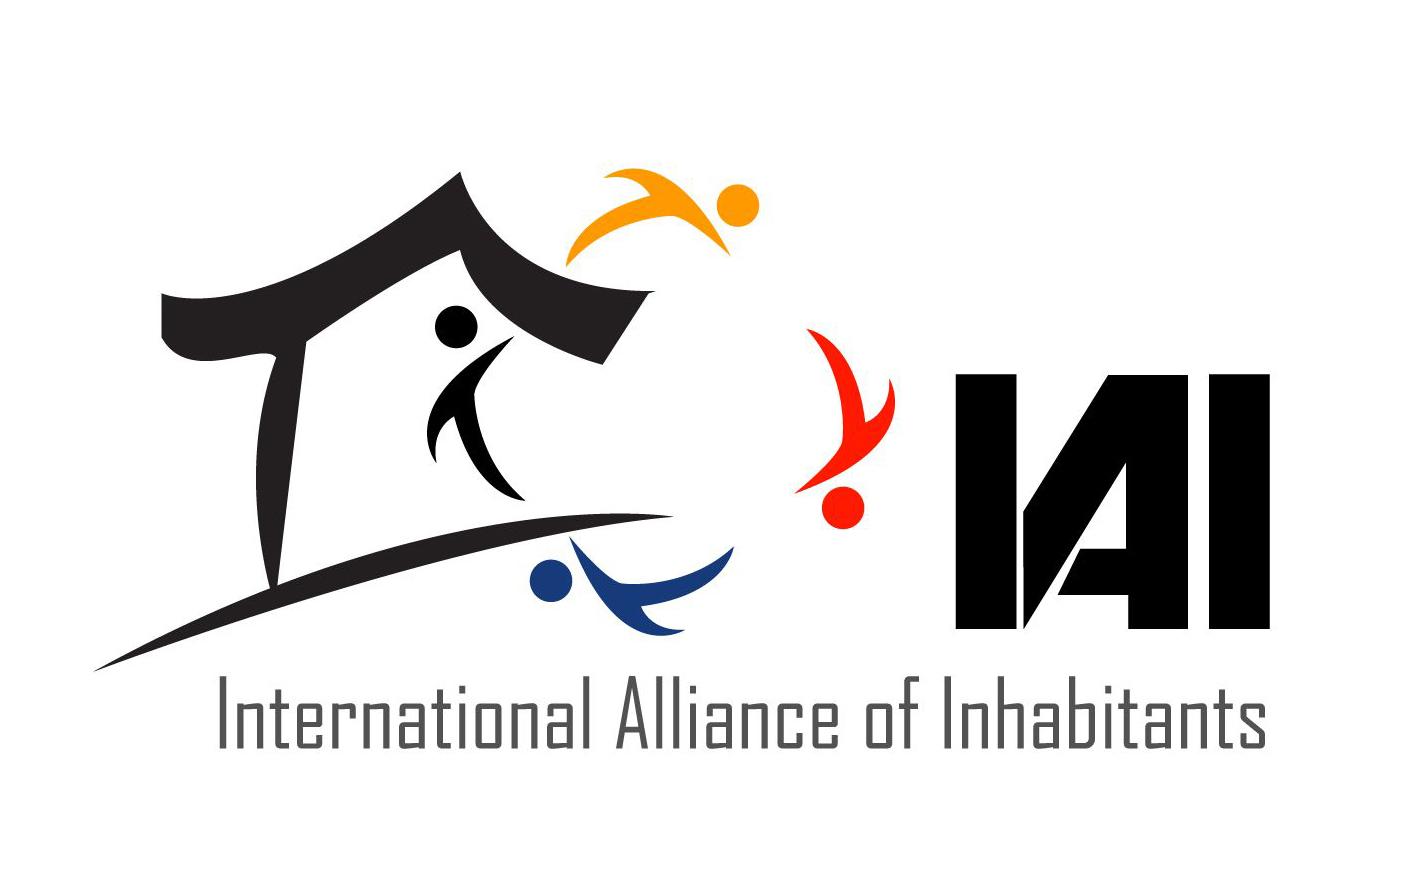 International Alliance of Inhabitants